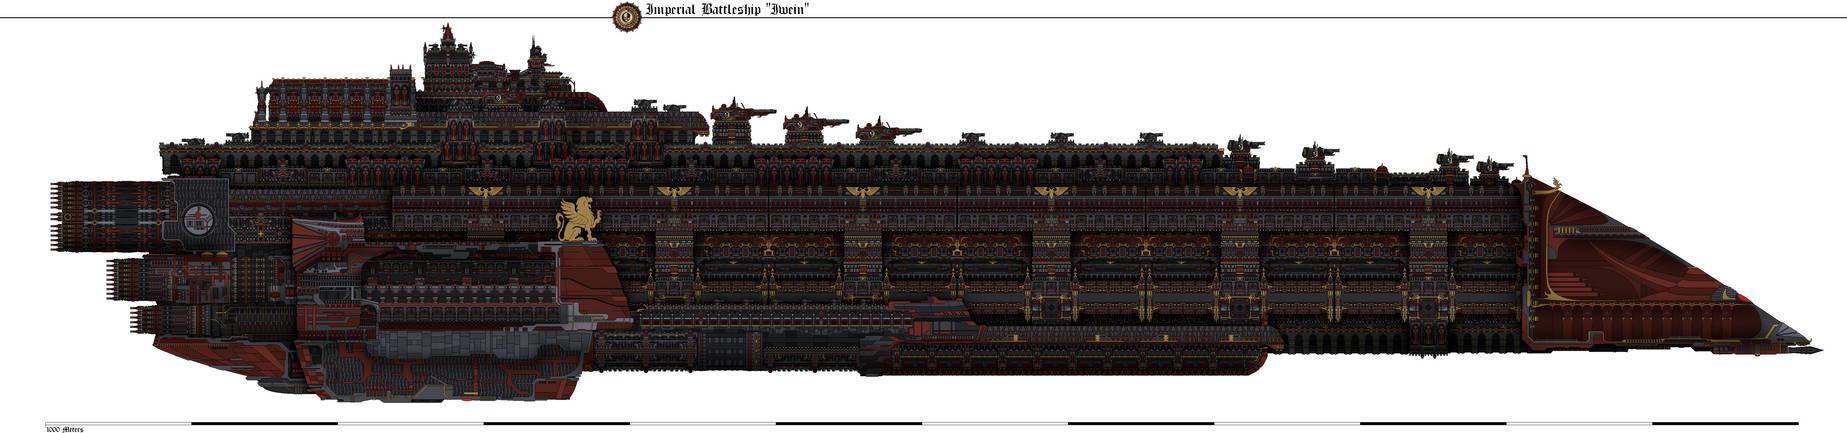 Battleship 'Iwein'